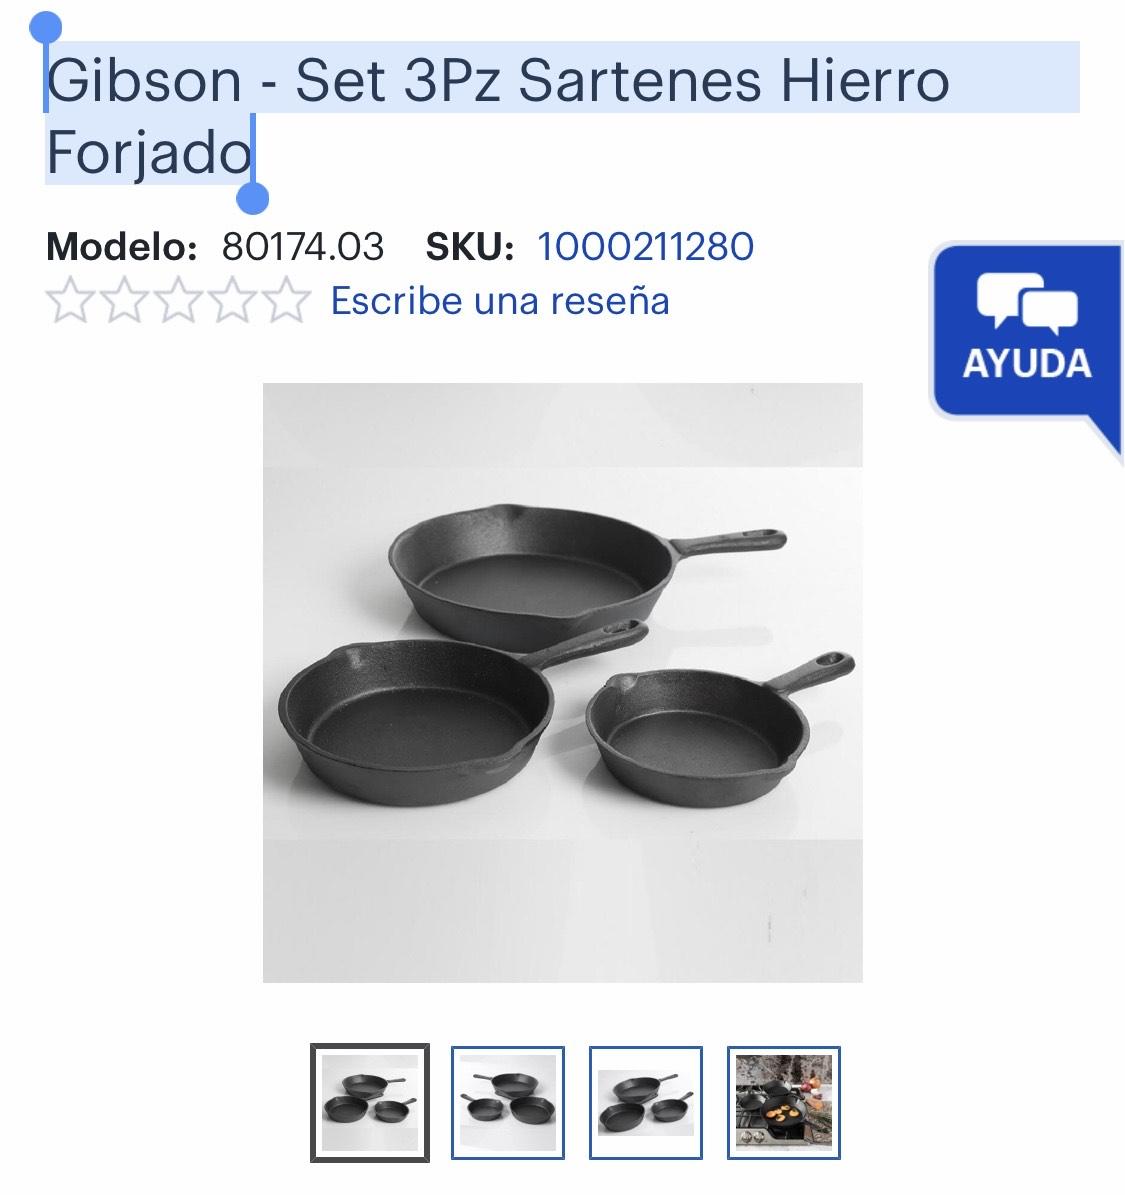 Best Buy: Gibson - Set 3Pz Sartenes Hierro Forjado